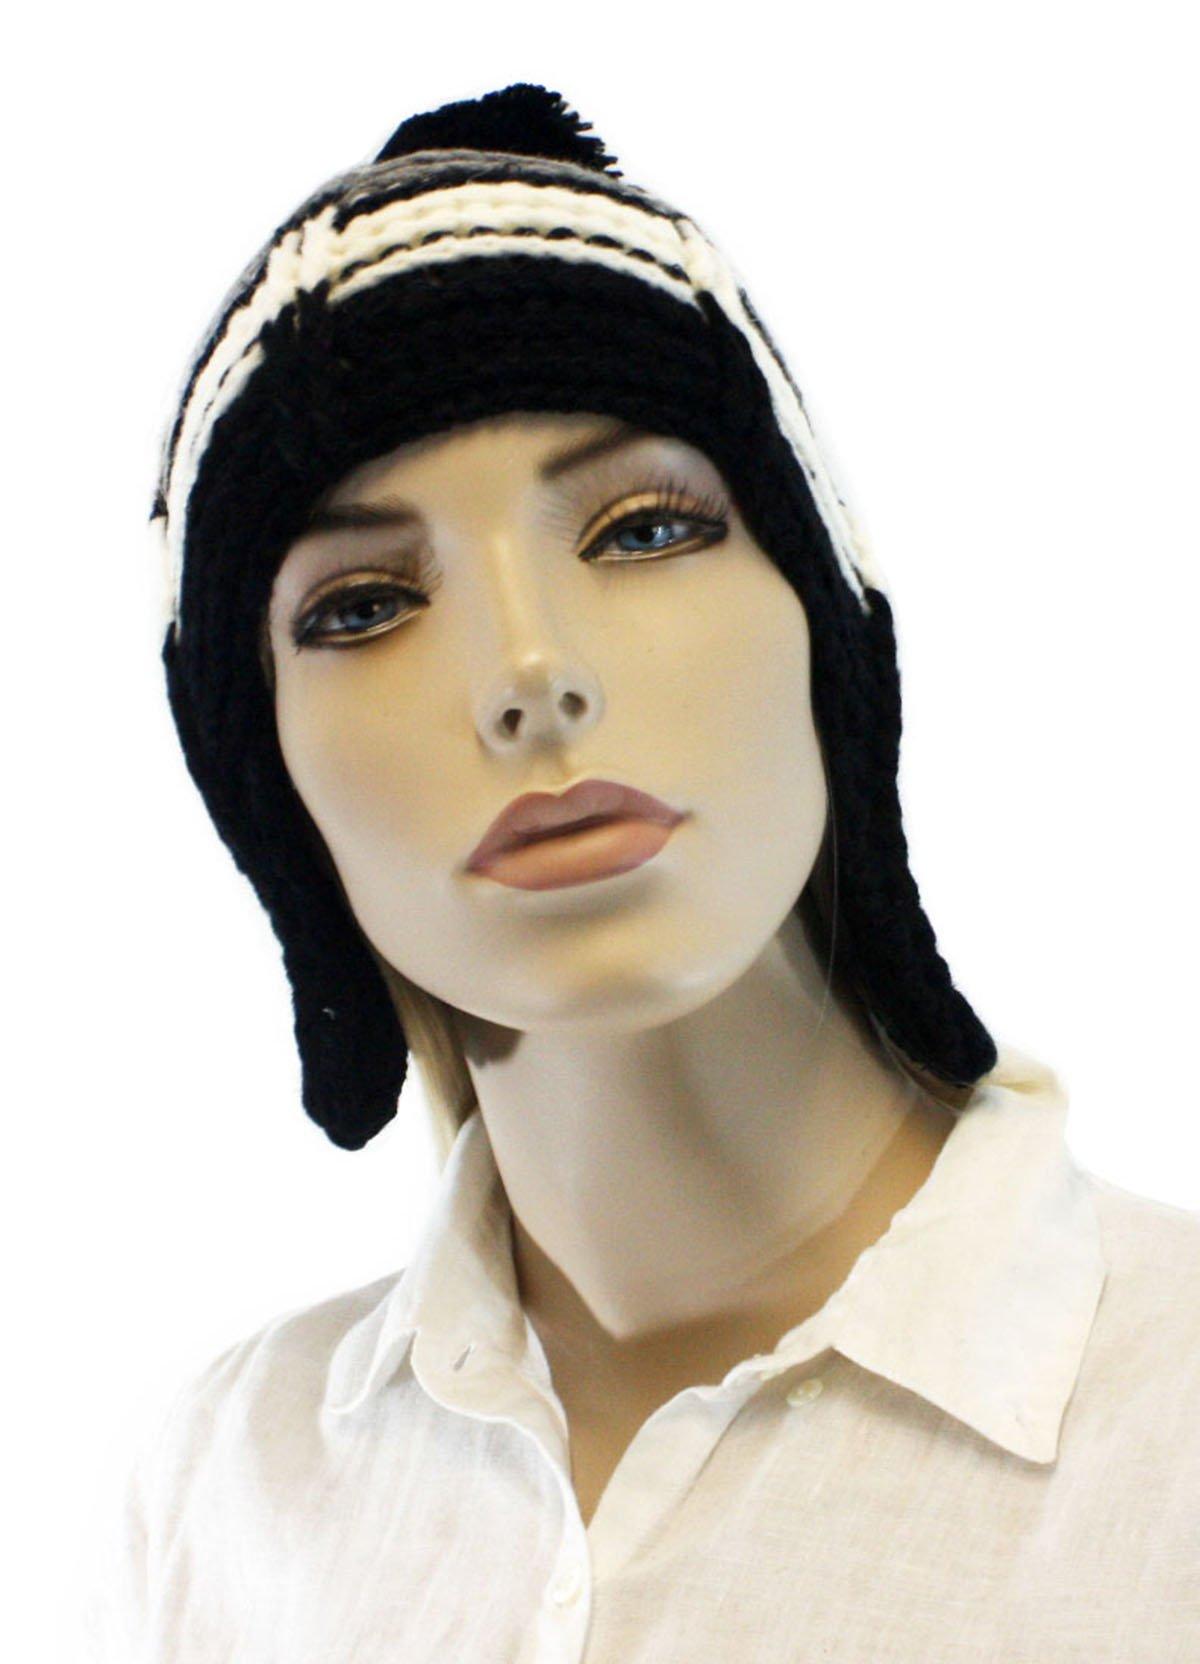 Fashion Dimensions Wild Black Trapper Hat with Top Pom